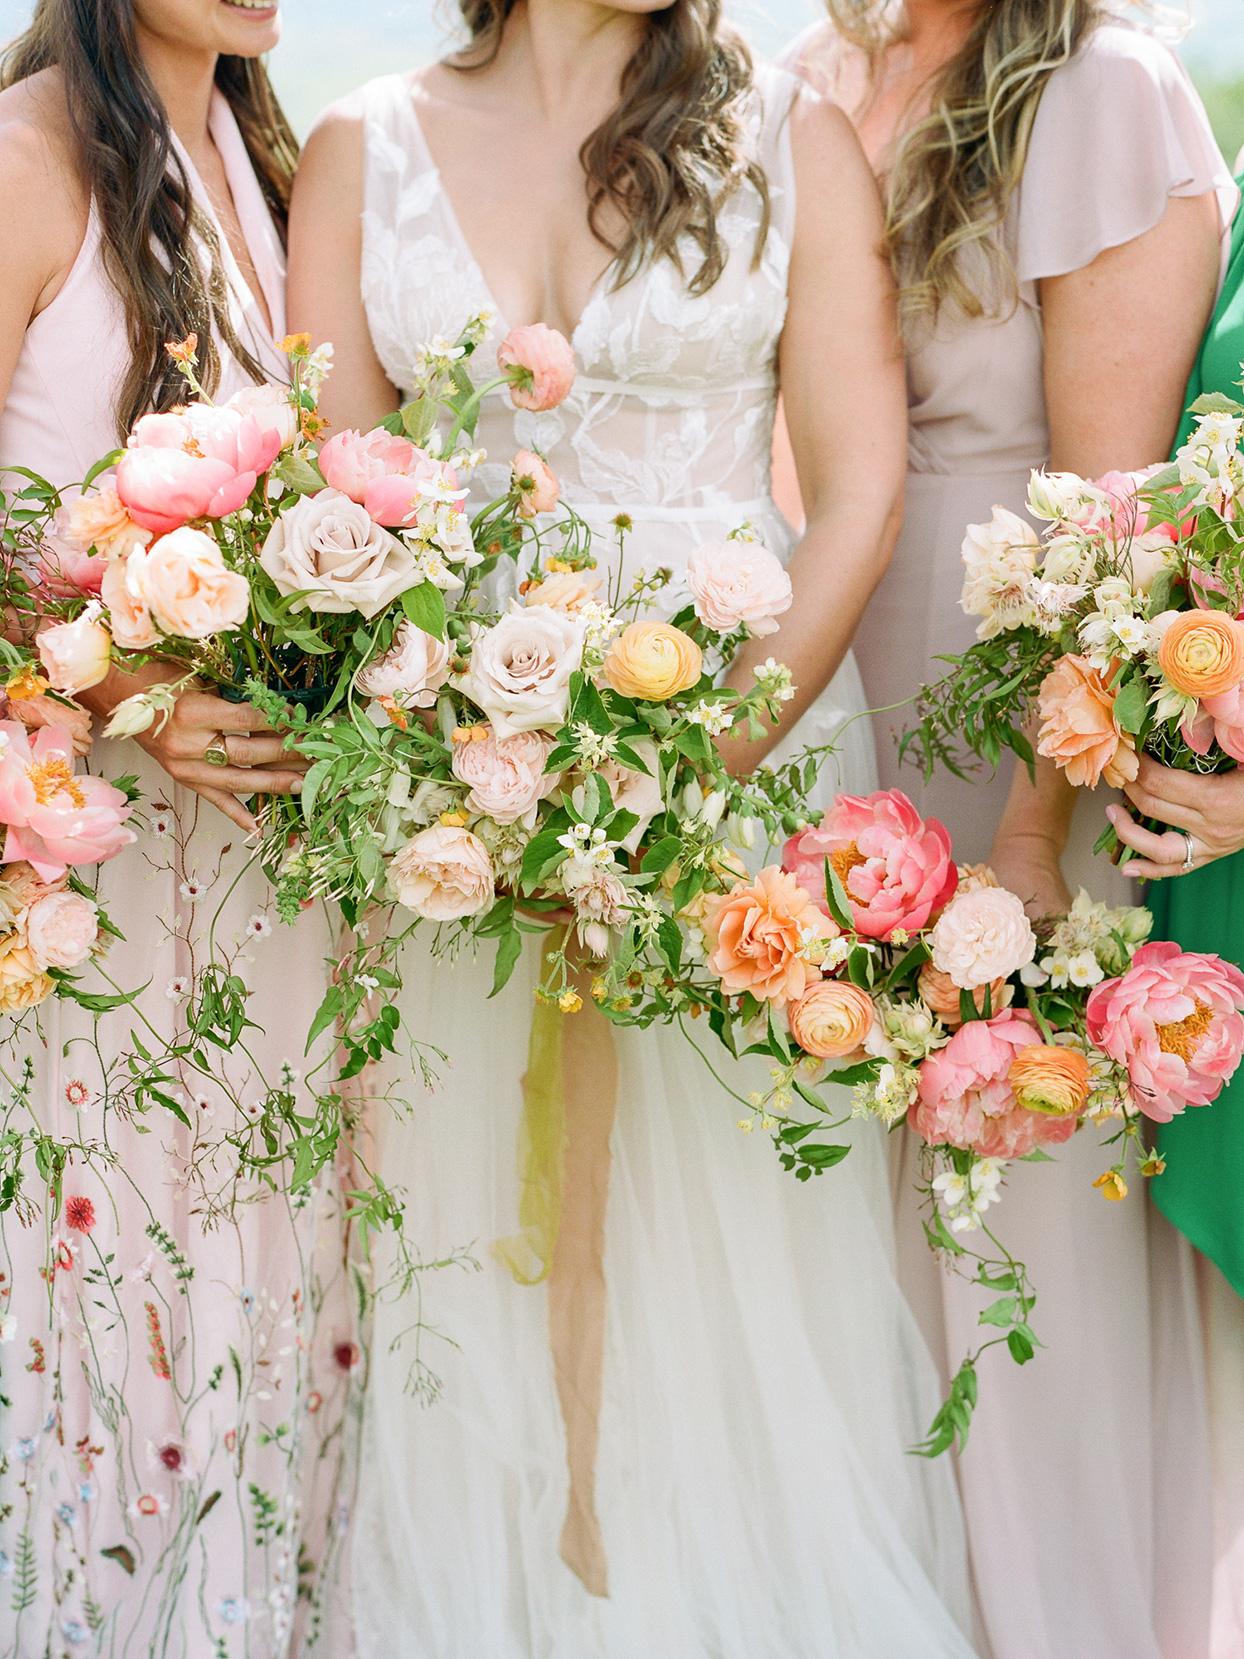 logan conor wedding bouquets orange and pink